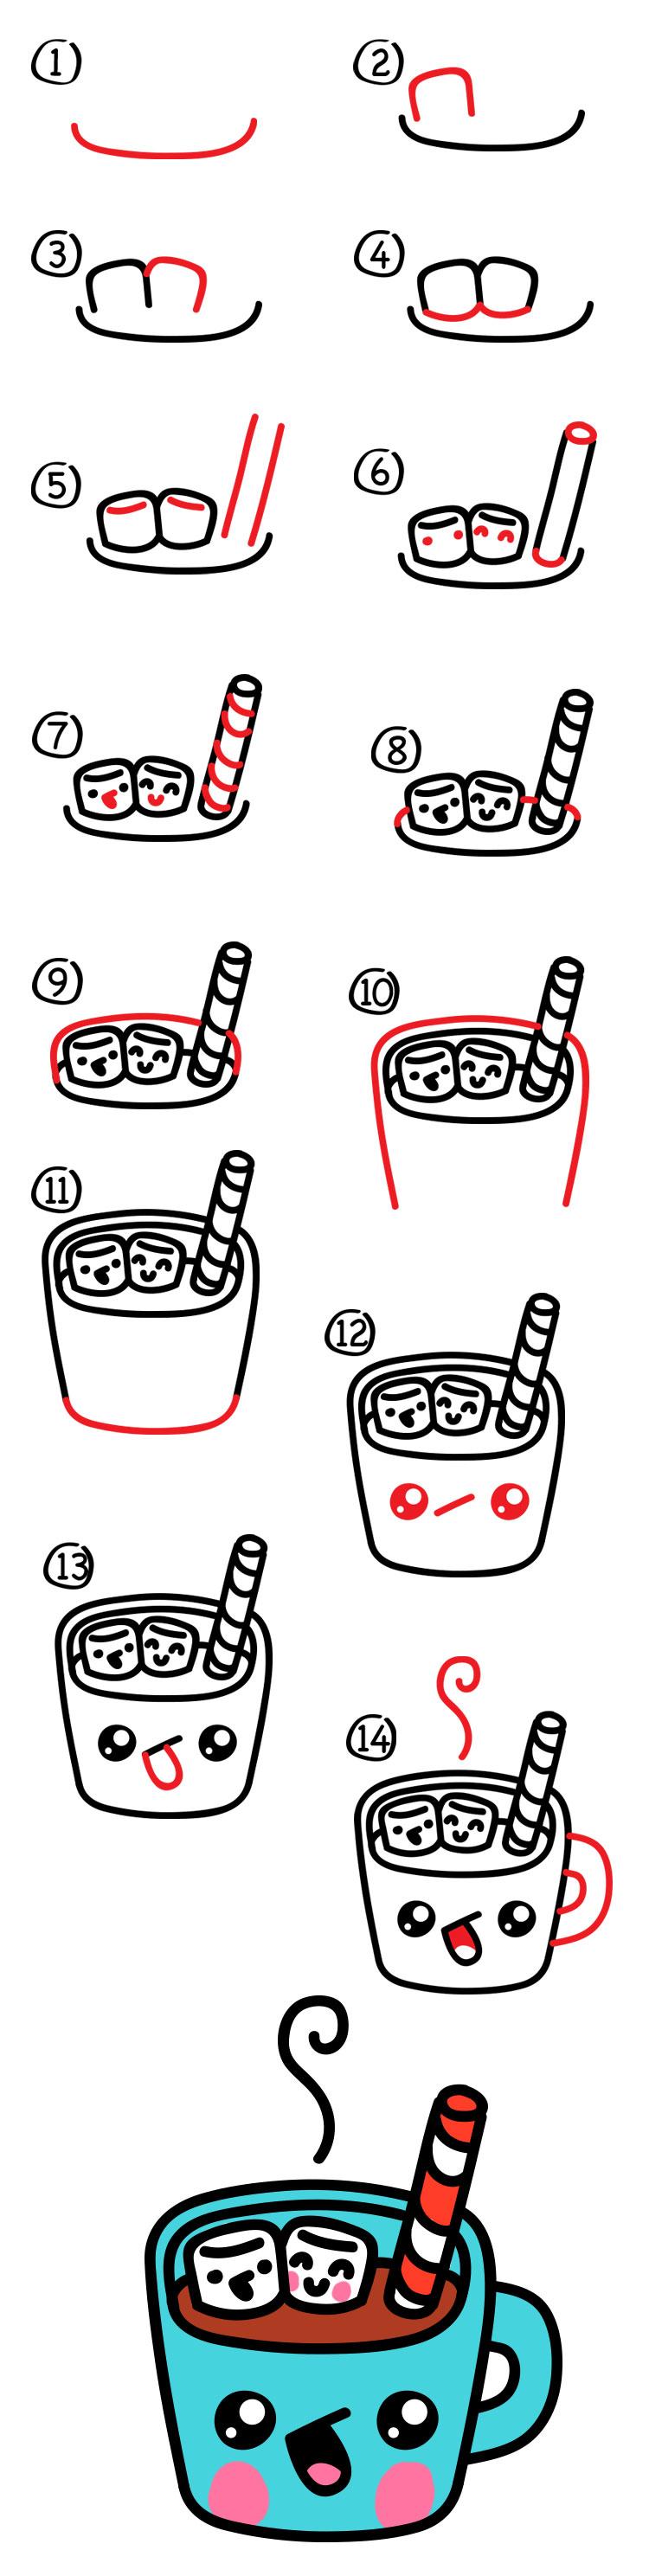 750x2977 How To Draw Cartoon Hot Chocolate